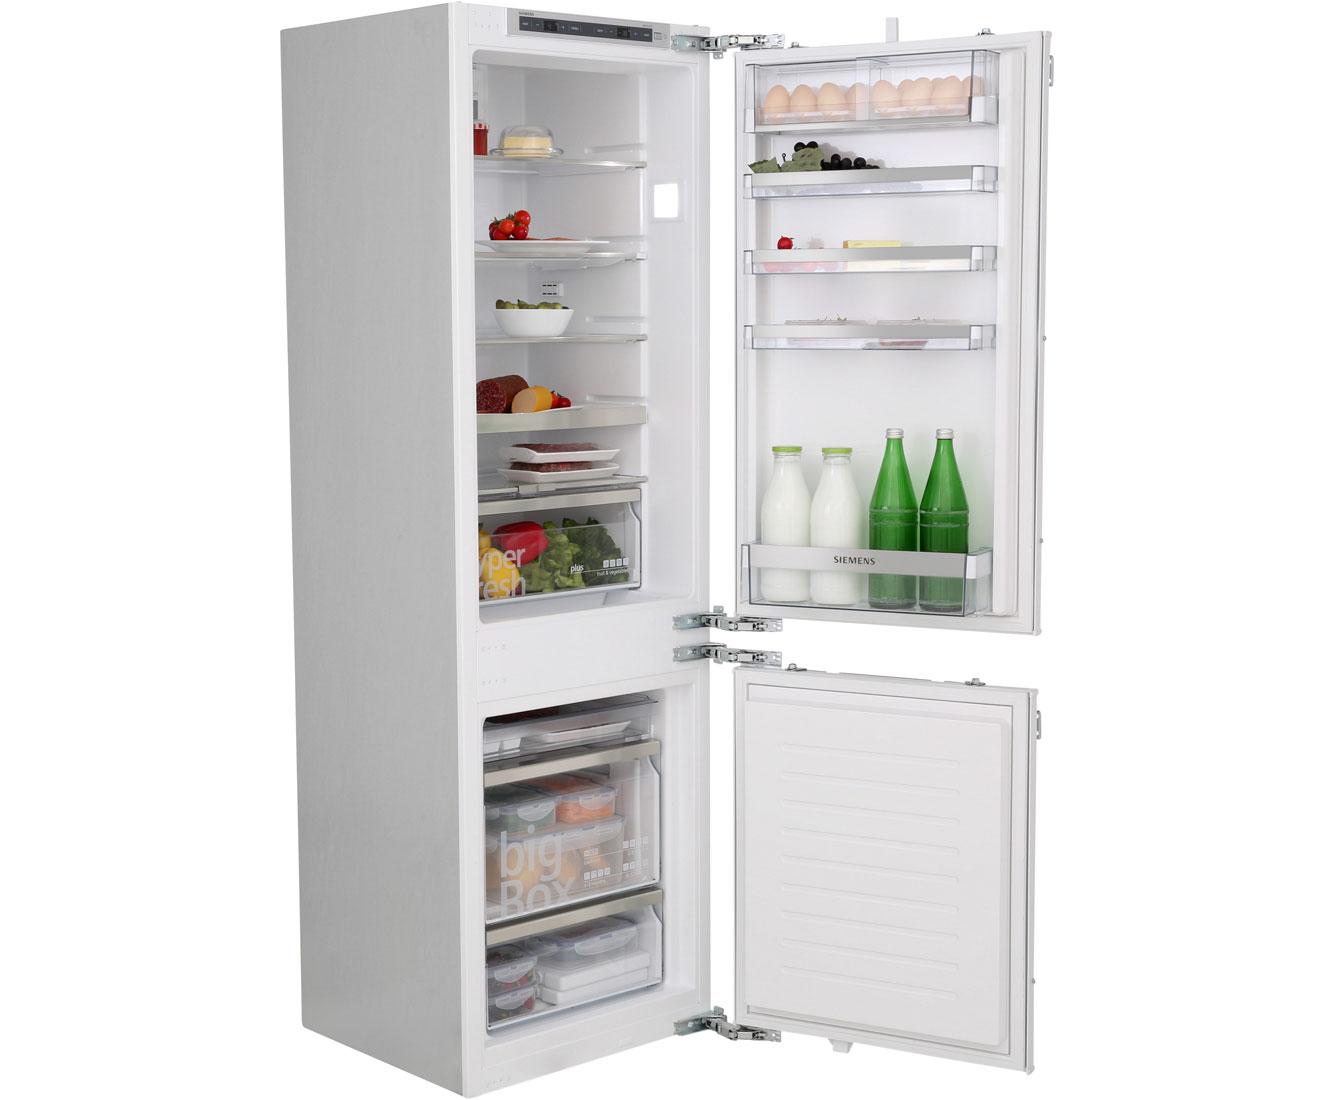 Siemens Kombi Kühlschrank : Siemens iq ki sad einbau kühl gefrierkombination er